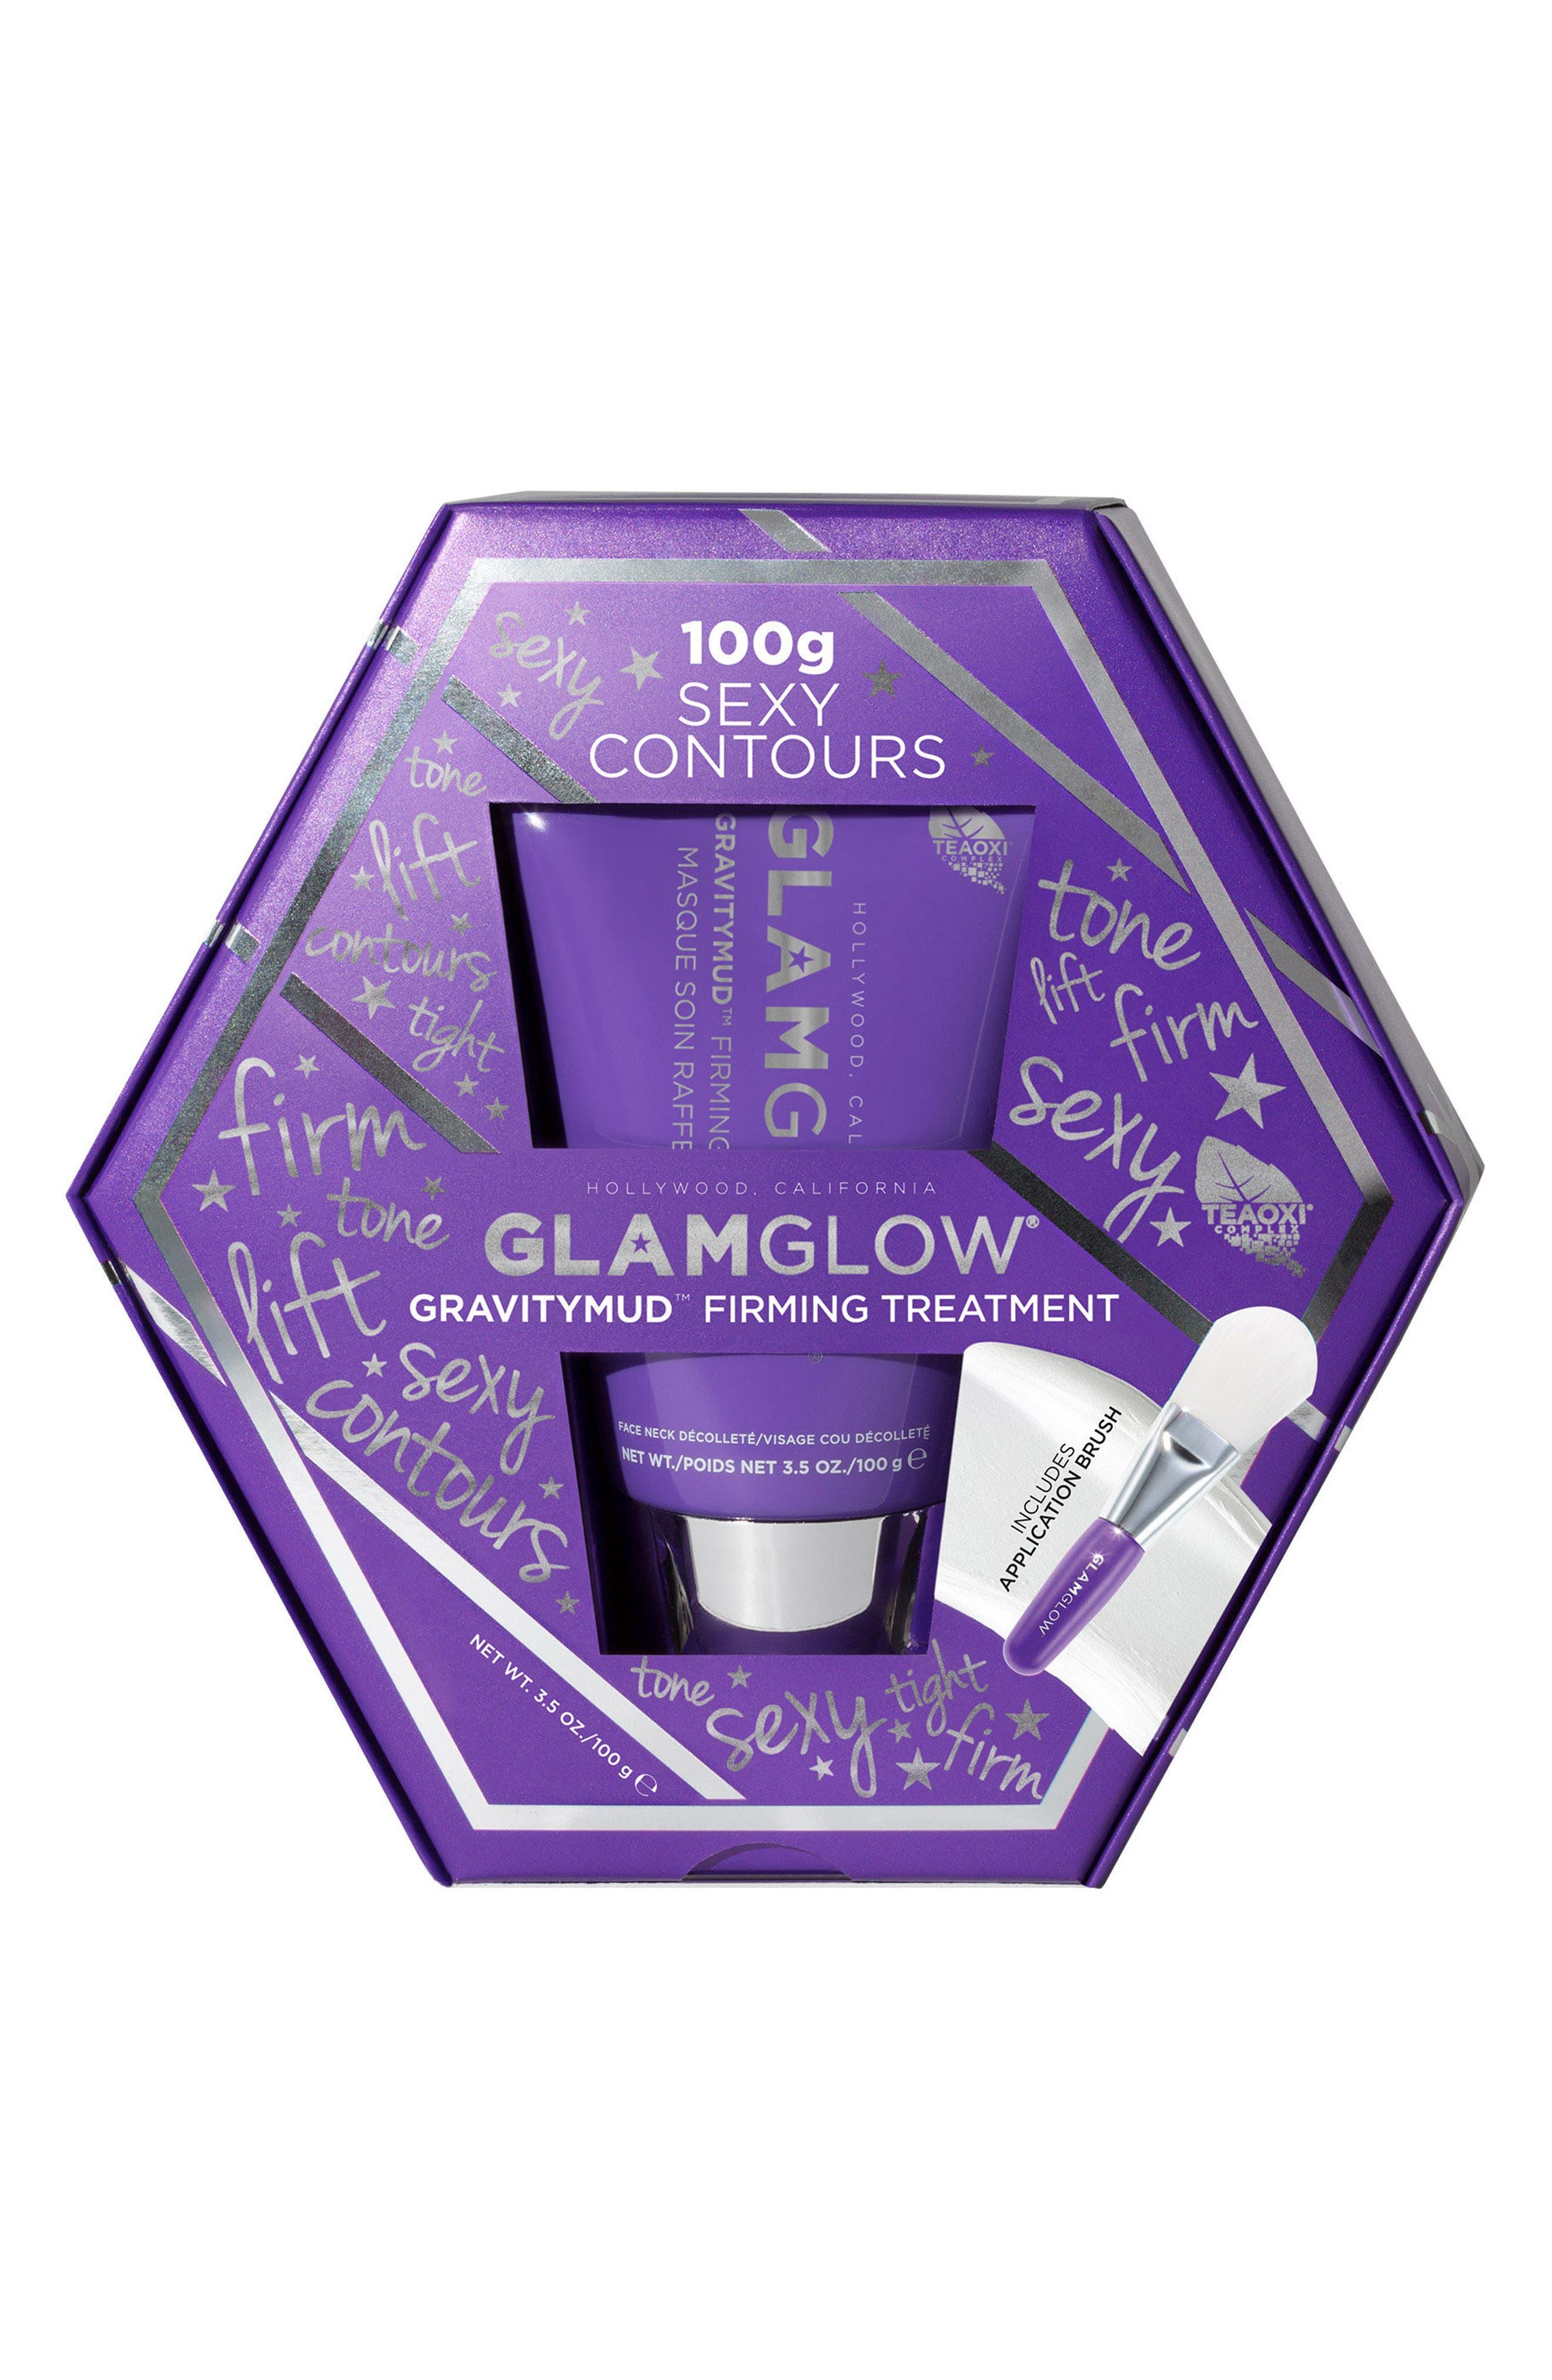 Alternate Image 1 Selected - GLAMGLOW® Jumbo Size GRAVITYMUD™ Firming Treatment Set ($152 Value)